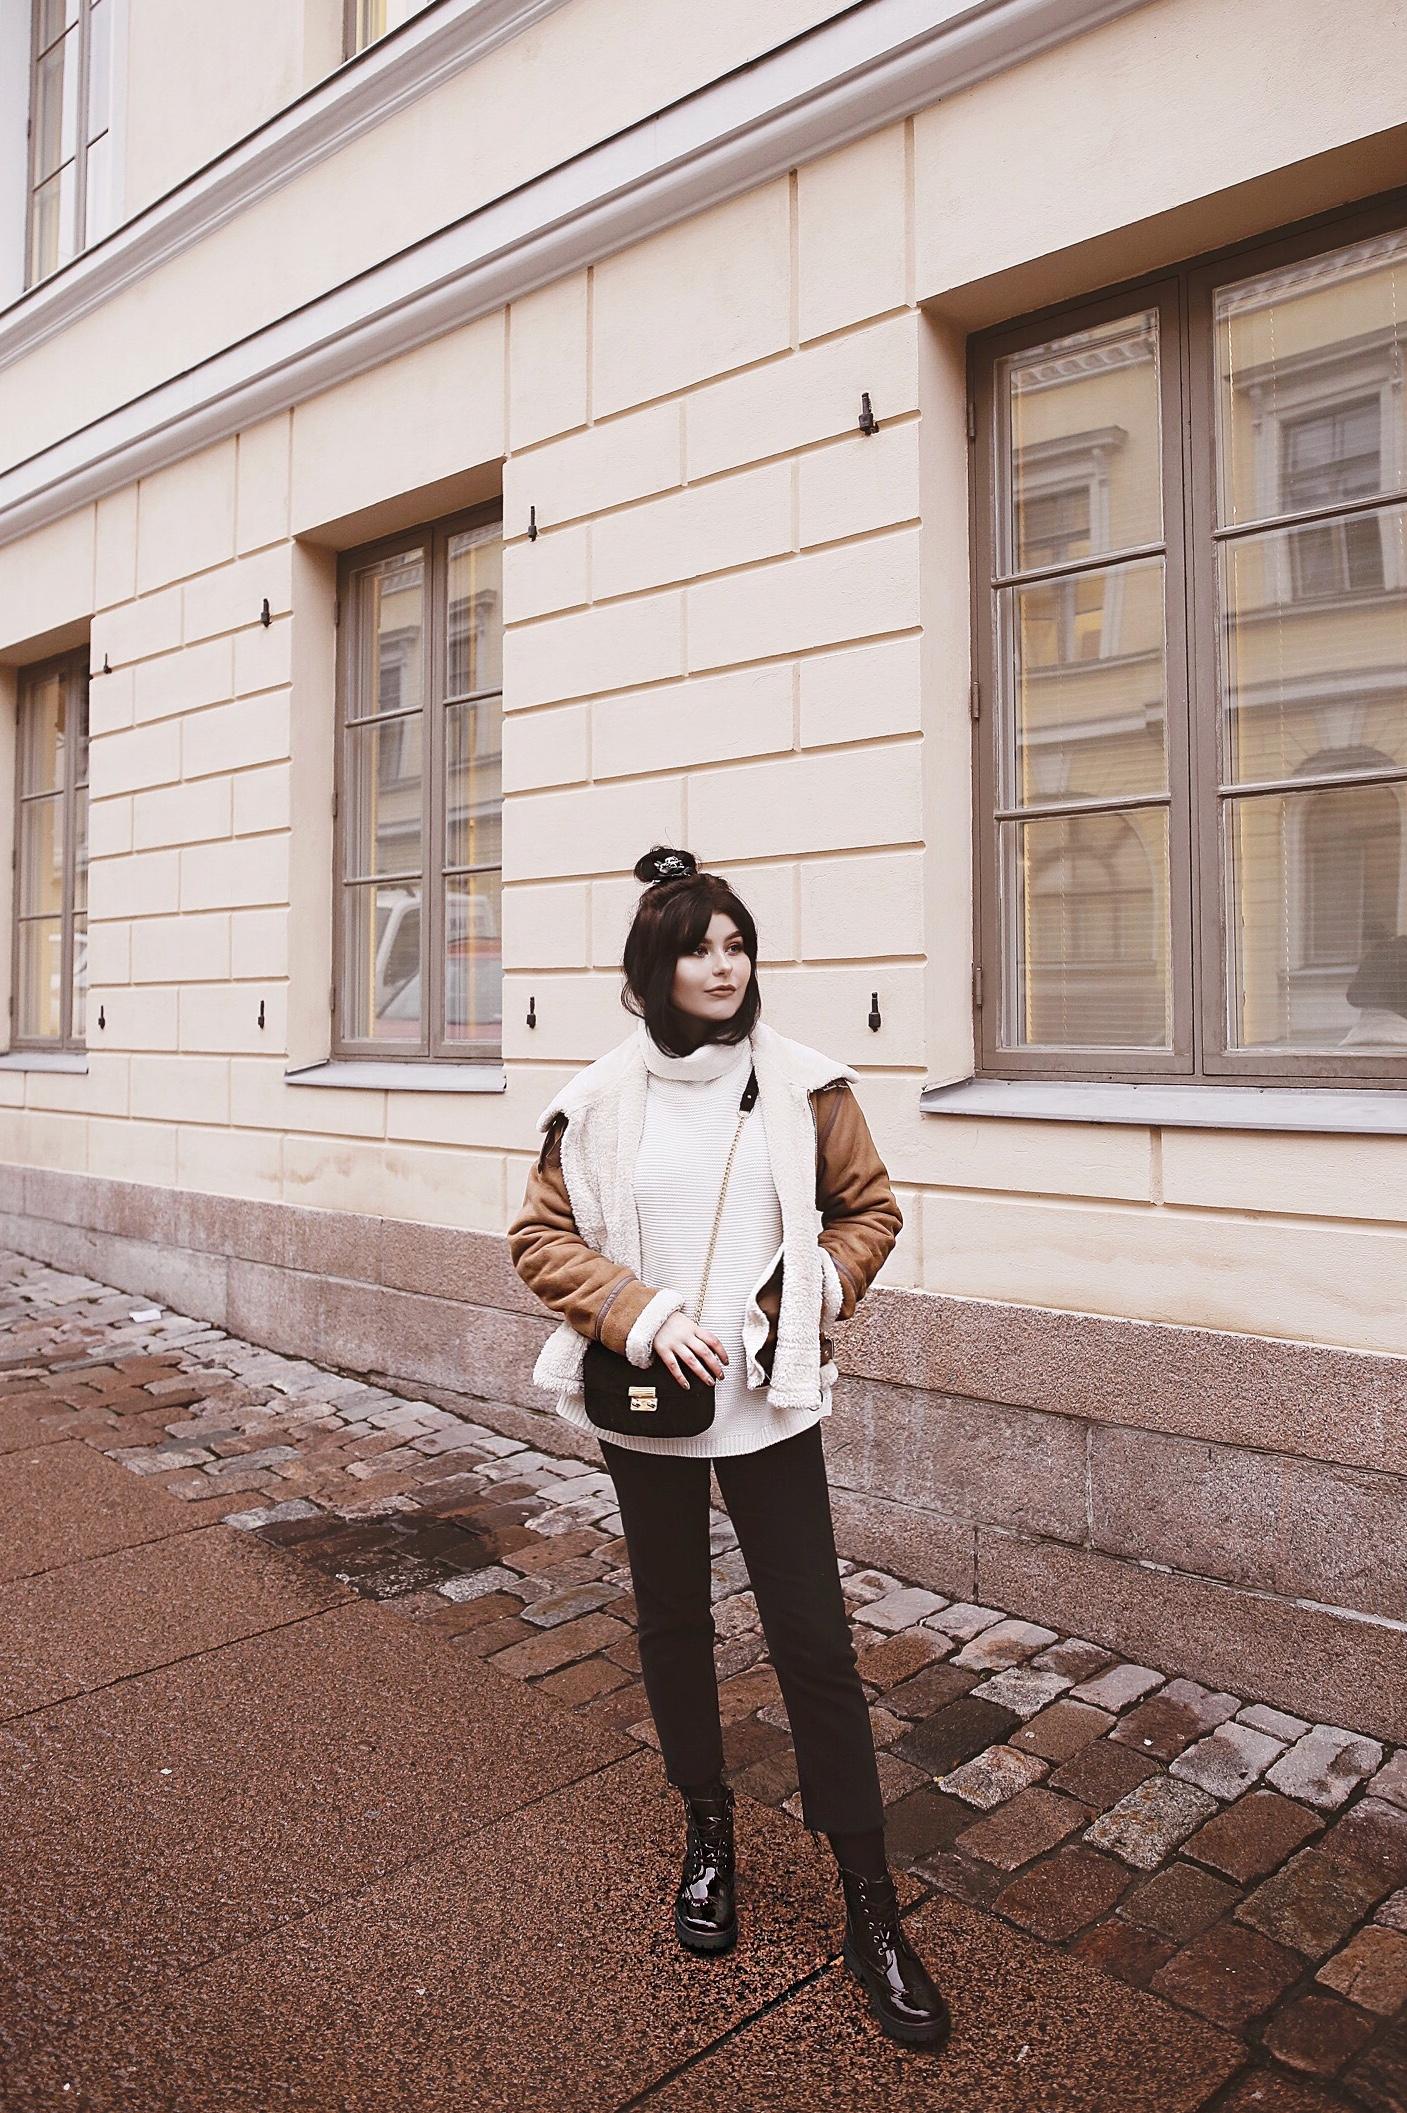 PEHMEÄ AVIATOR + LAHJAKORTIN ARVONTA! | EMILIA IDA MARIA